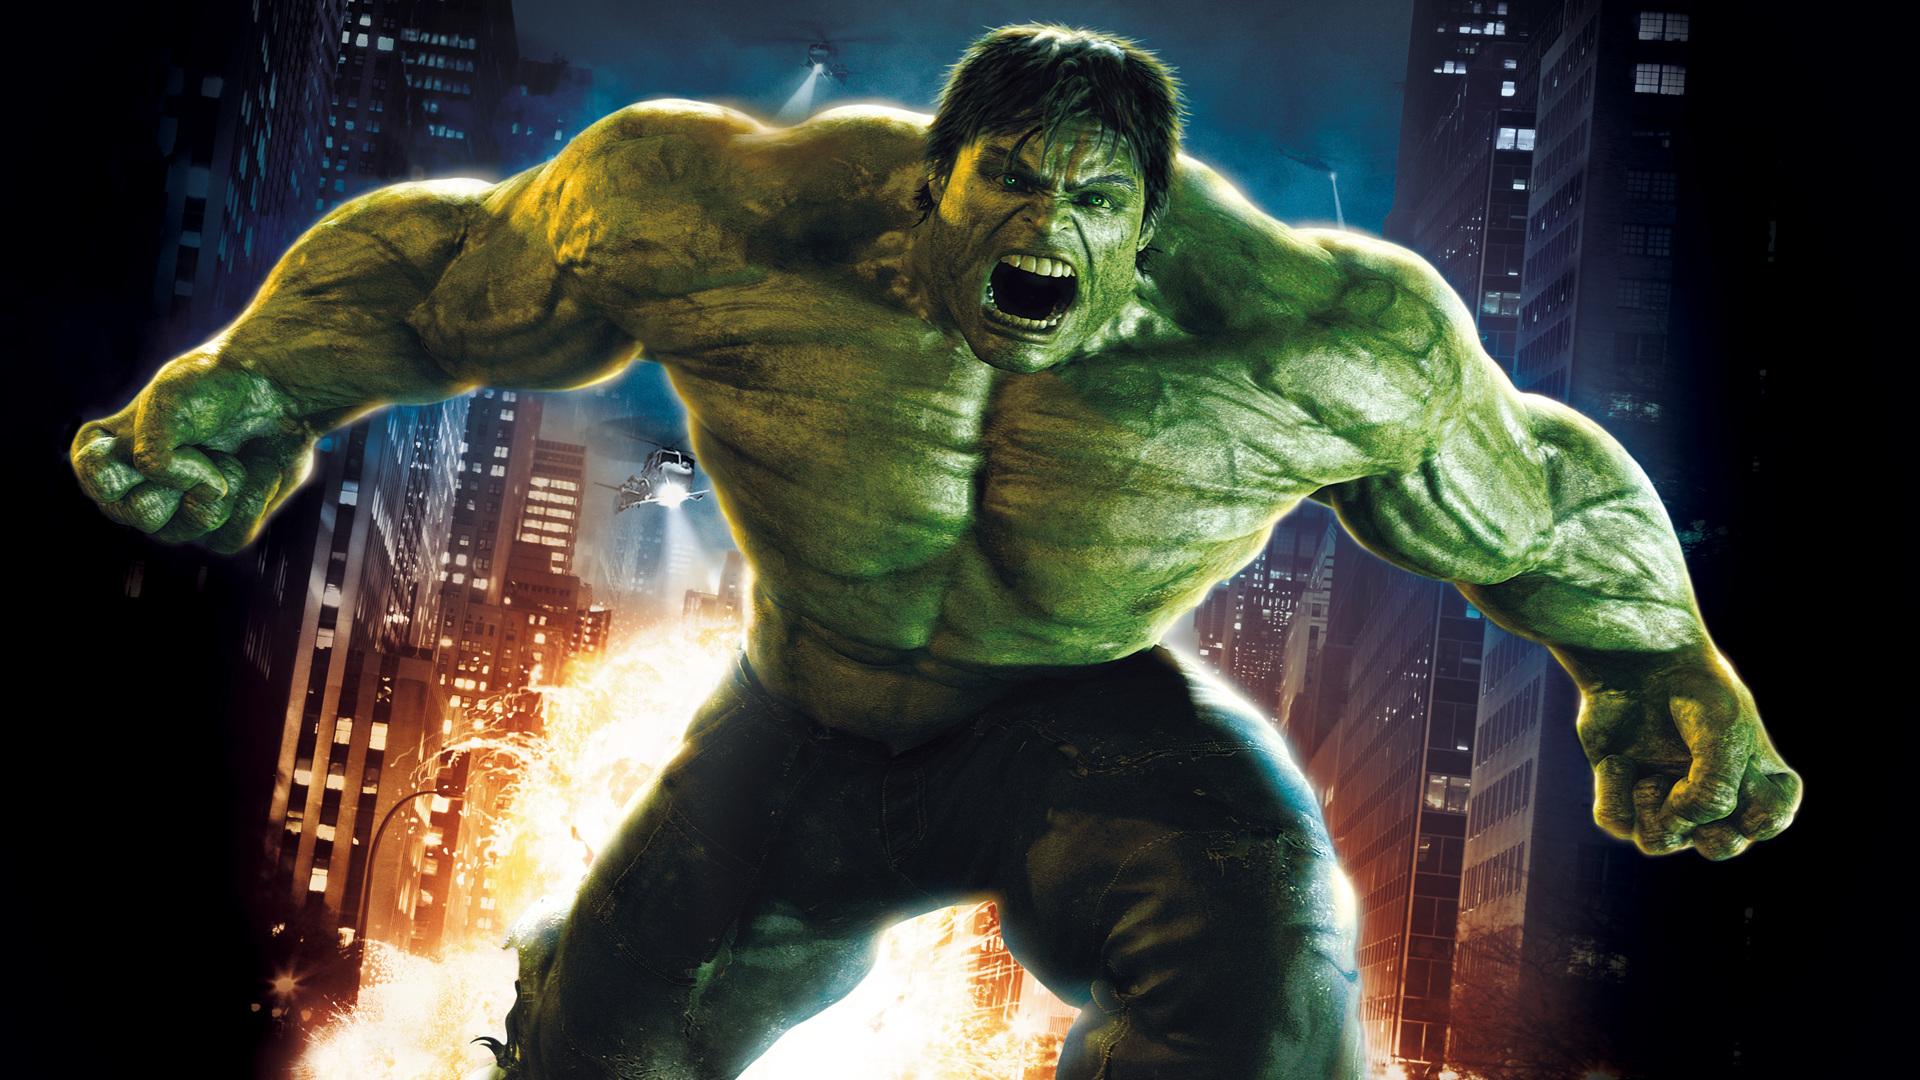 Hulk Wallpapers, Pictures, Images  Avengers Wallpaper Hd Hulk